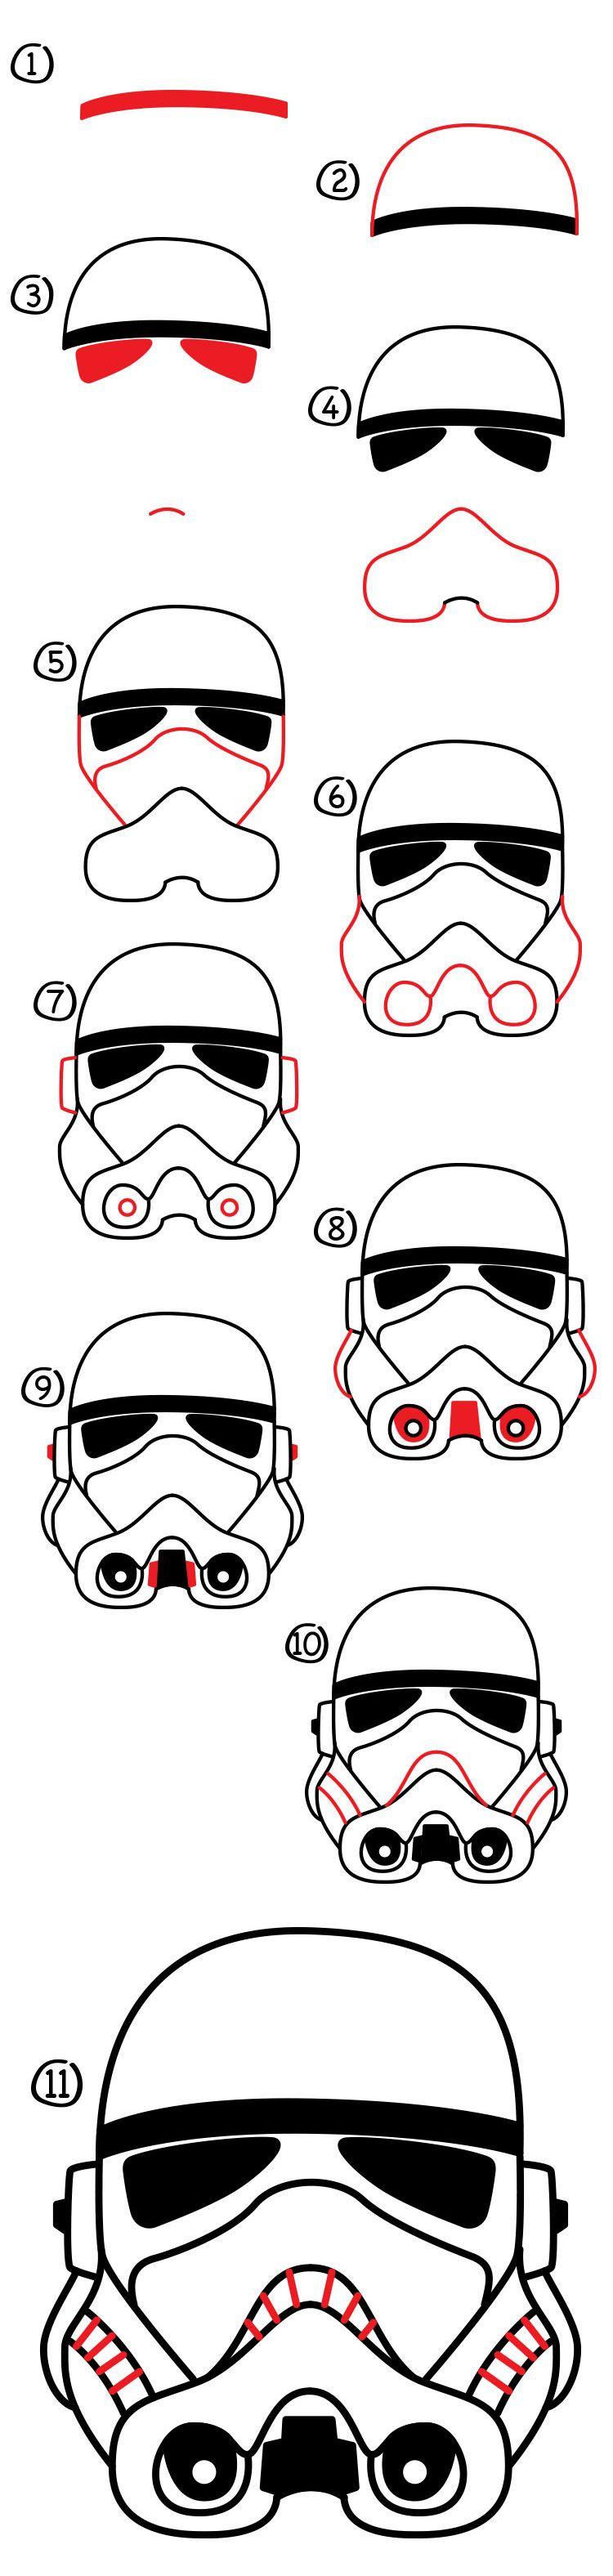 How To Draw A Stormtrooper Helmet Art For Kids Hub Dessin